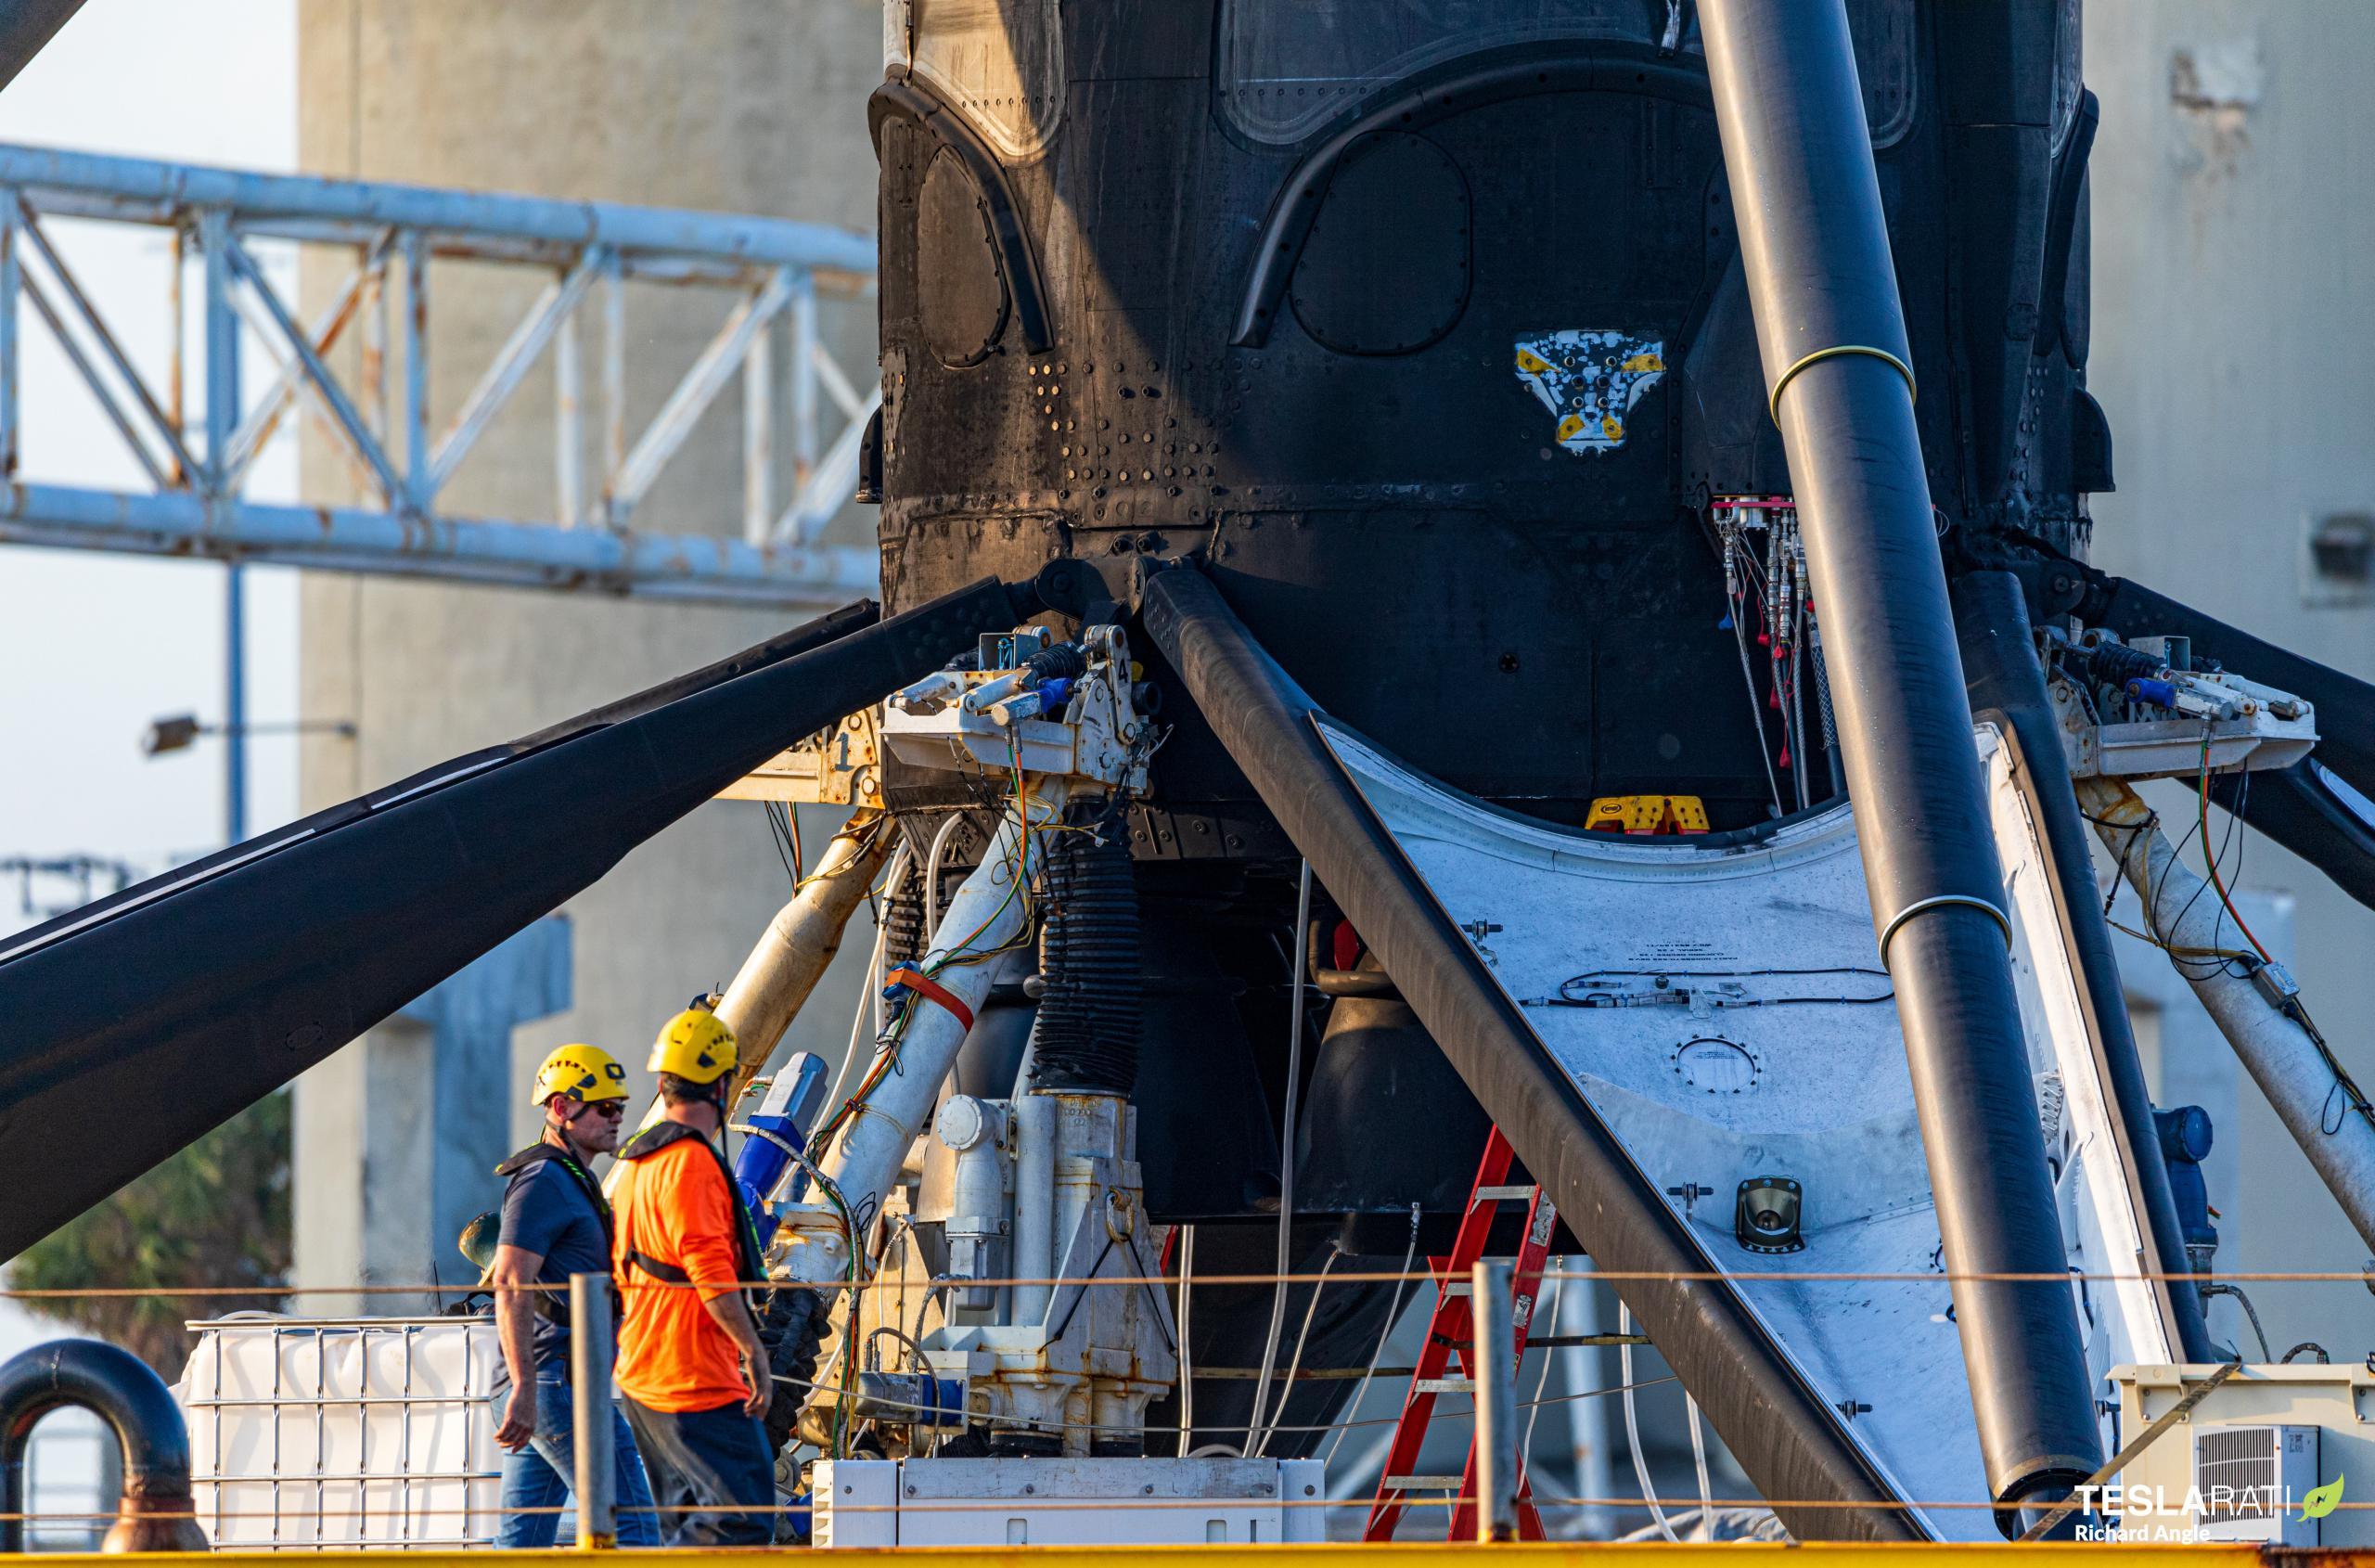 Starlink-21 Falcon 9 B1051 031621 (Richard Angle) port return 4 (c)